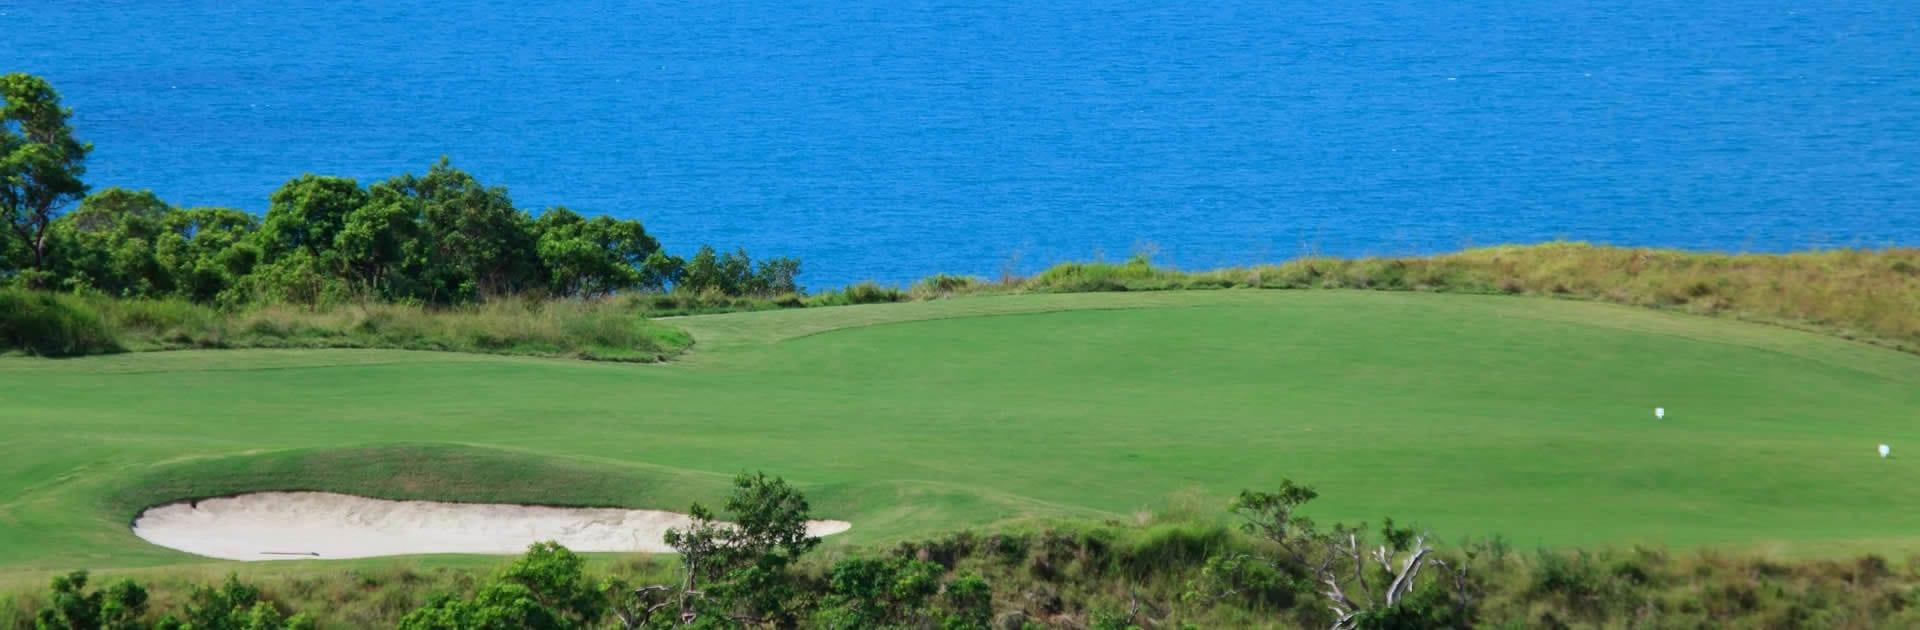 engineering-surveys-golf-course-slide